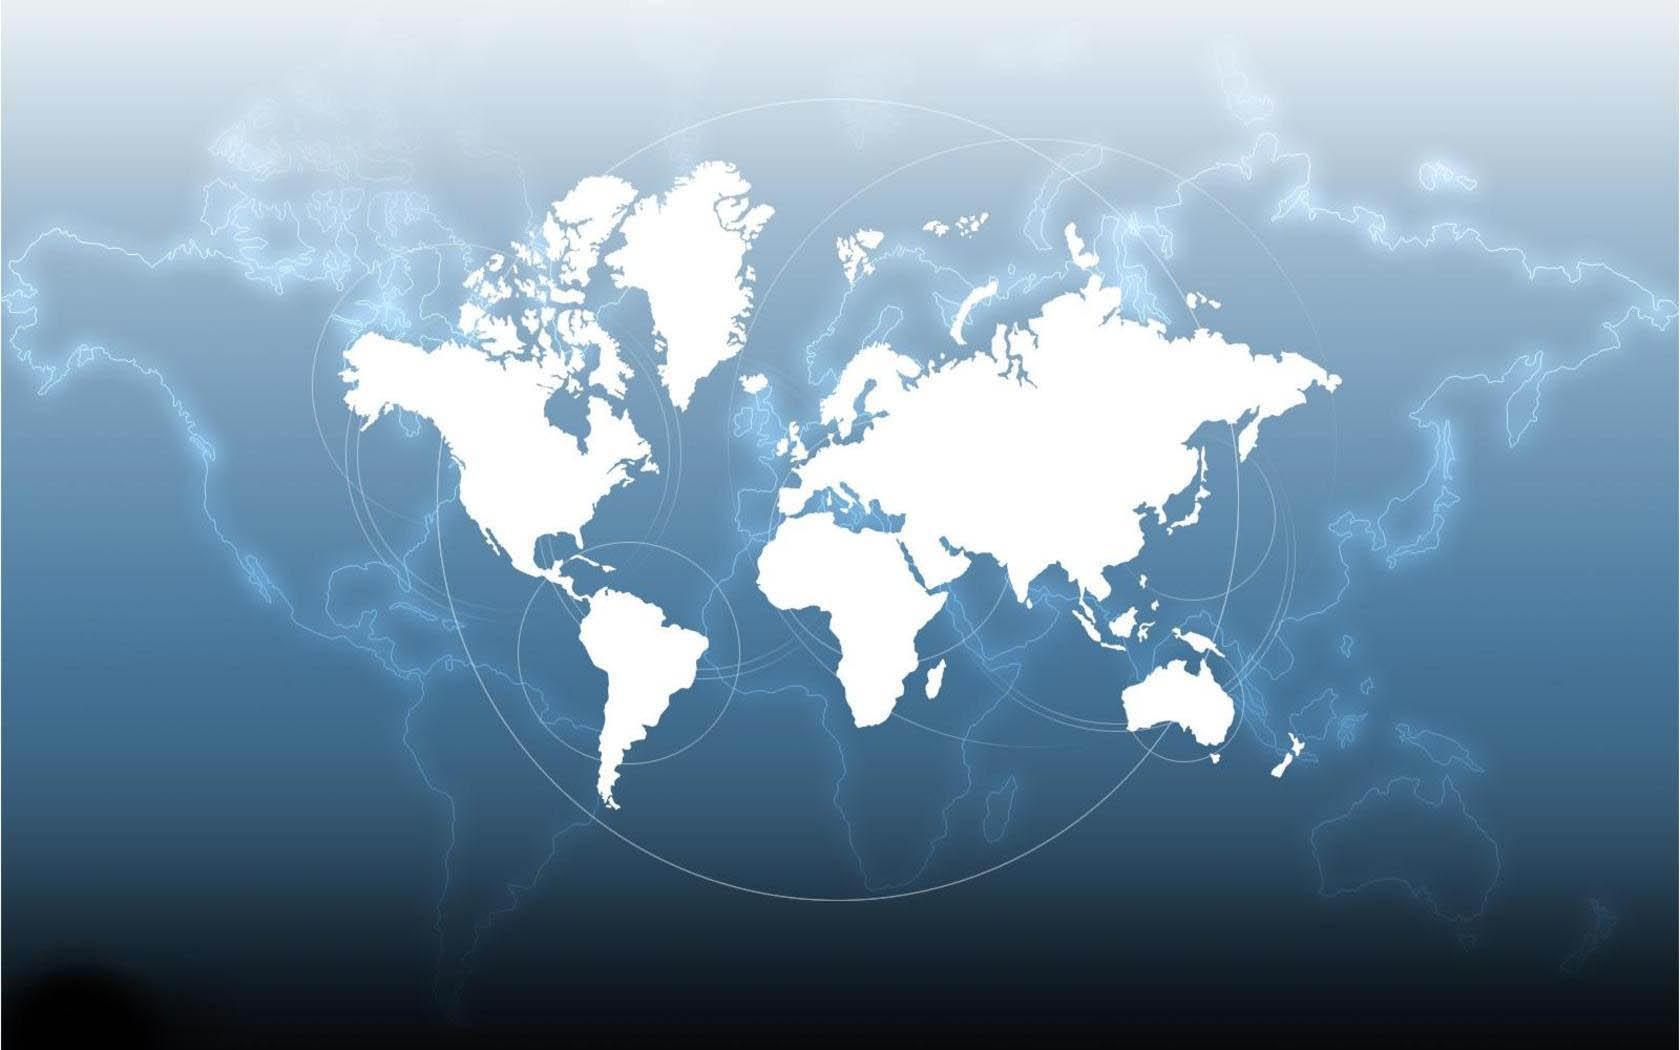 Картинка Карта мира - Картинки 3D ...: pictar.ru/img-karta-mira-26088.htm